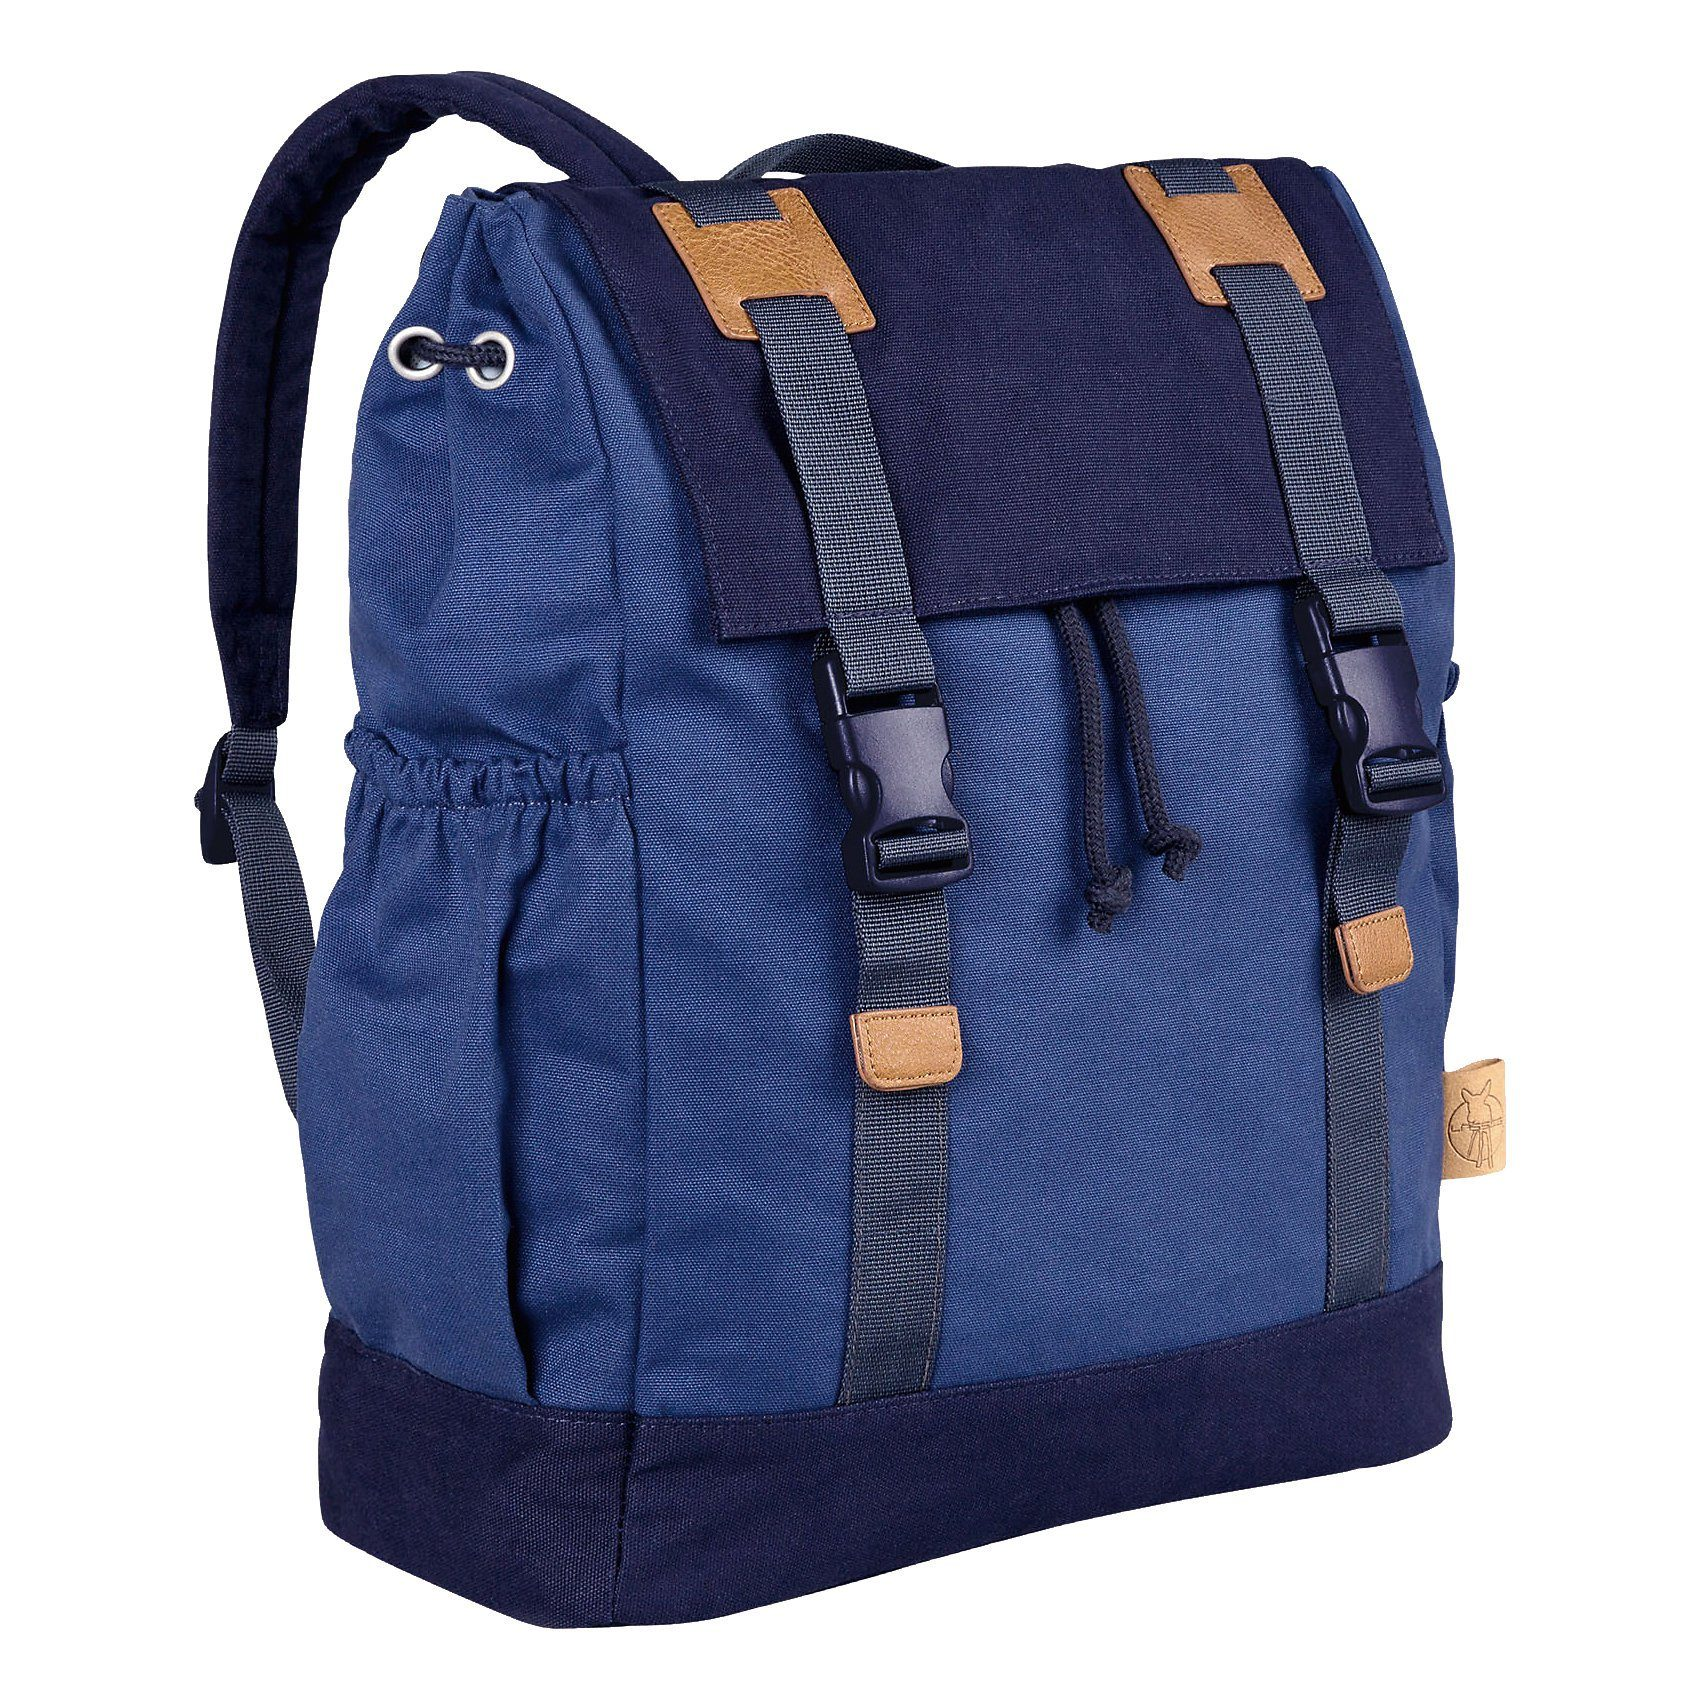 Lässig Wickelrucksack Little One & Me Backpack big, blue